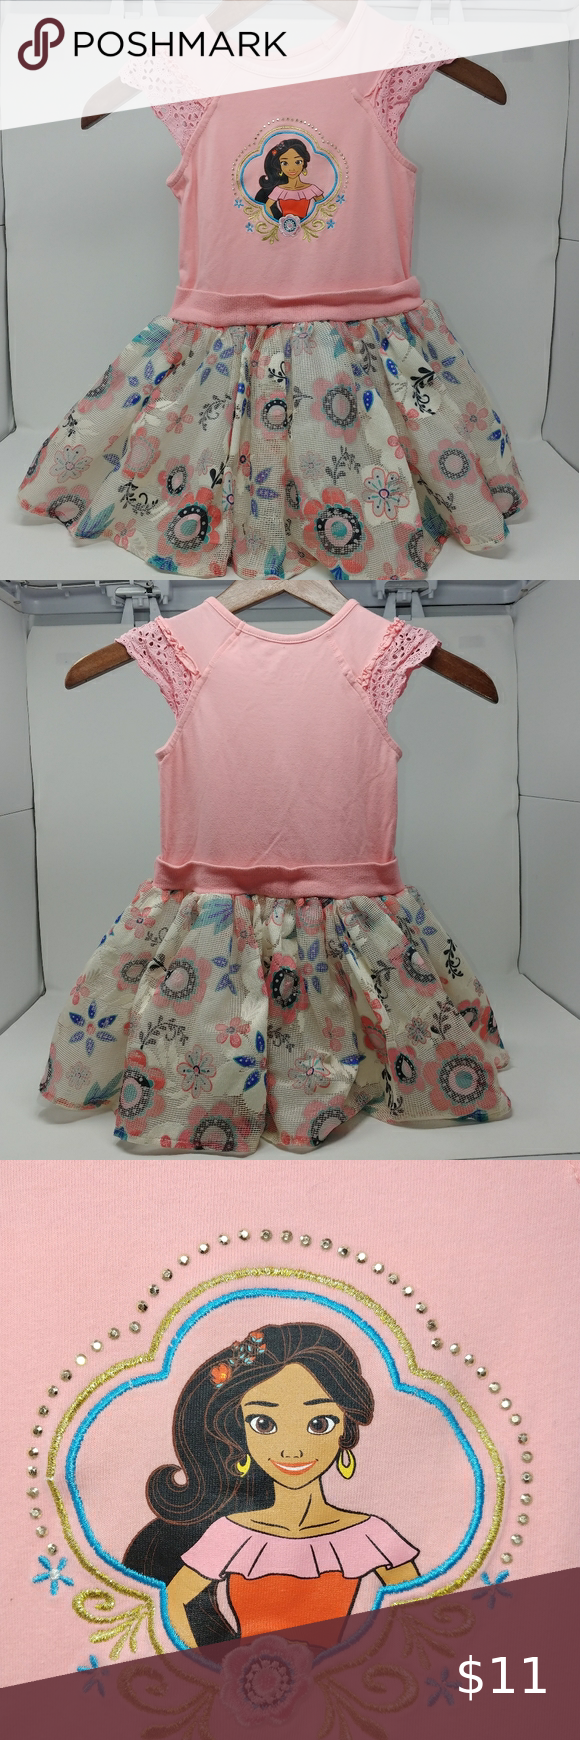 Disney Elena Dress Pink Floral Size 4t Pink Dress Dresses Disney Dresses [ 1740 x 580 Pixel ]